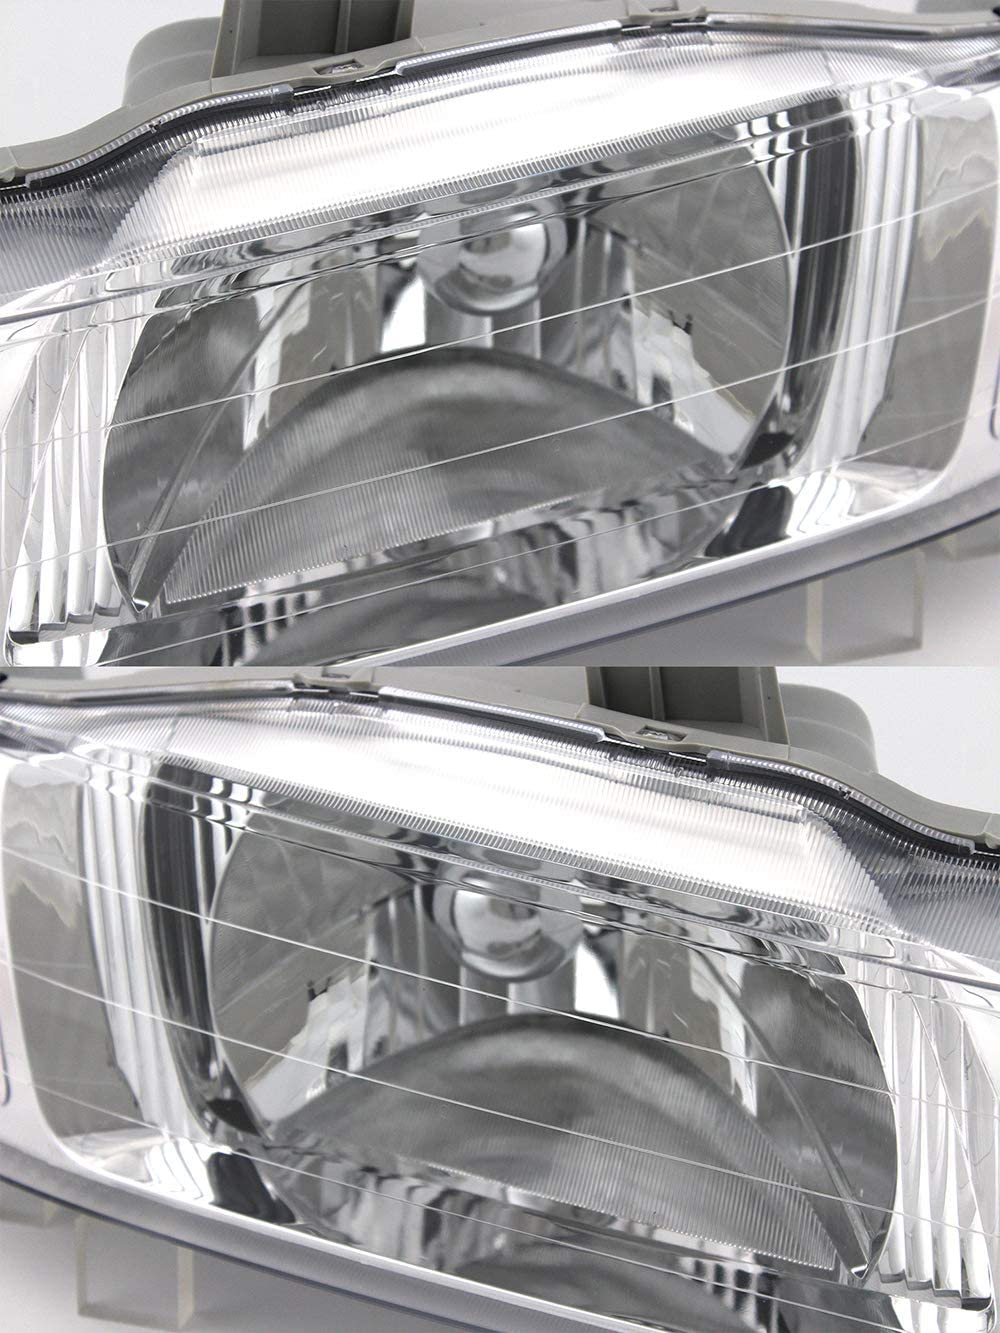 -Black 100W Halogen 6 inch Passenger Side with Install kit 2001 Honda Odyssey Post Mount Spotlight Larson Electronics 1015P9IJOJA